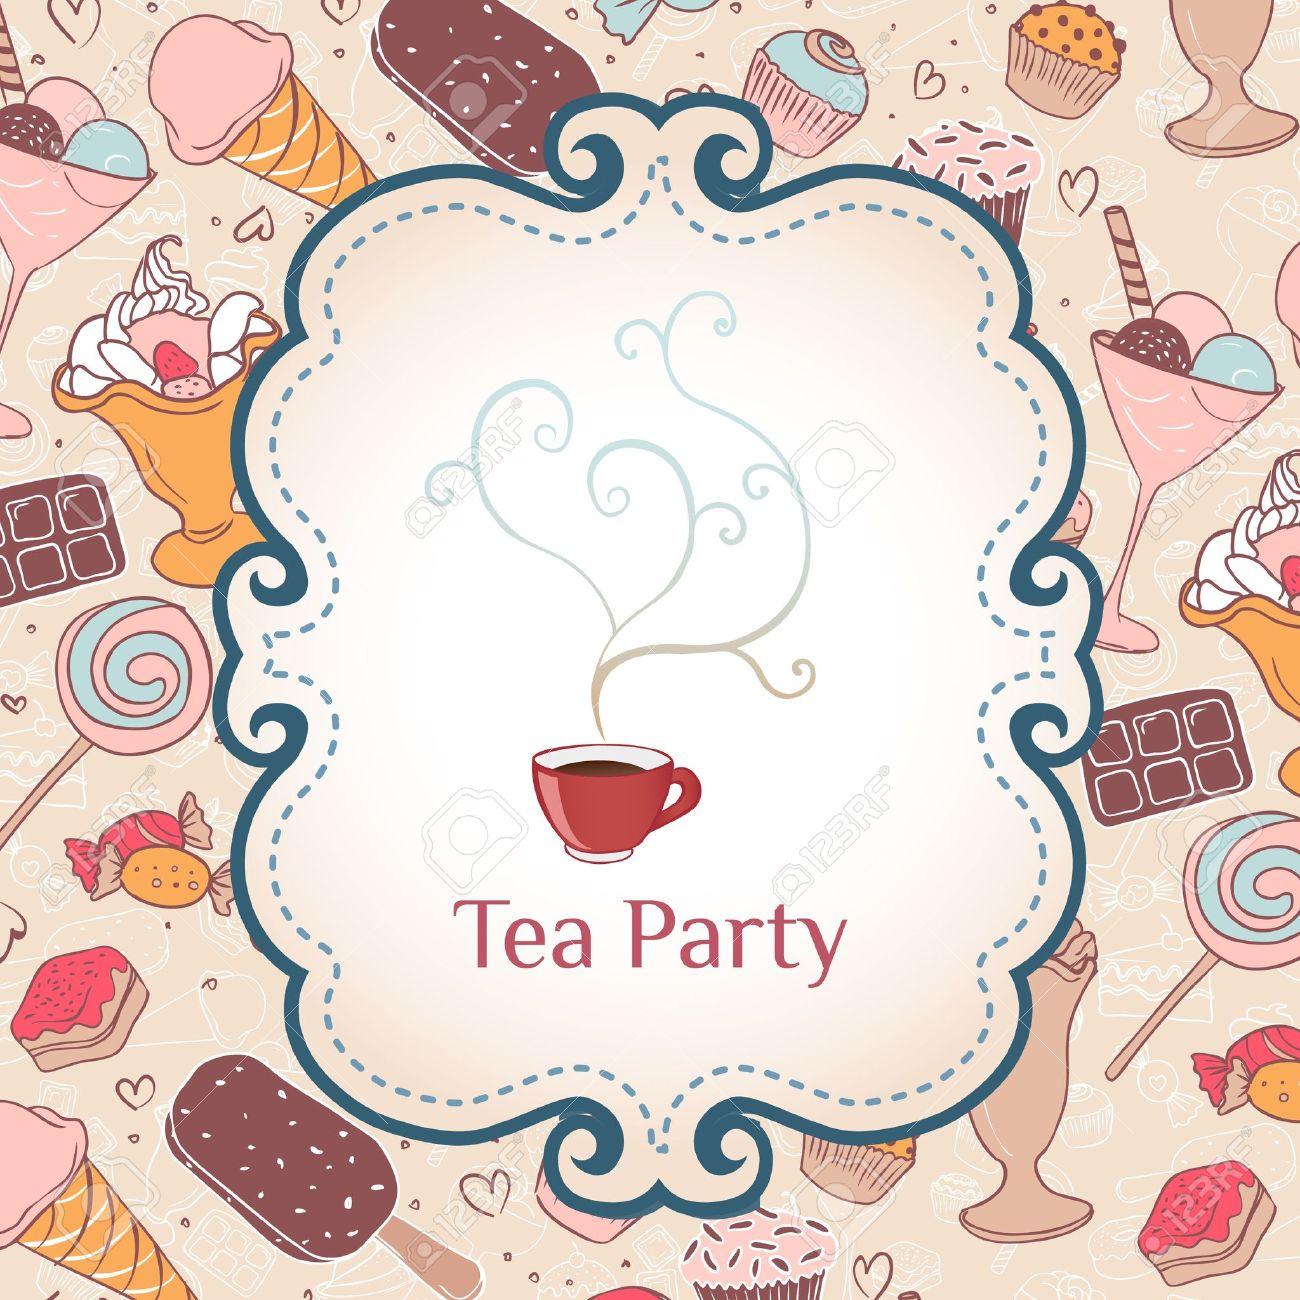 Tea Party Invitation Vintage Style Frame. Vector Illustration ...